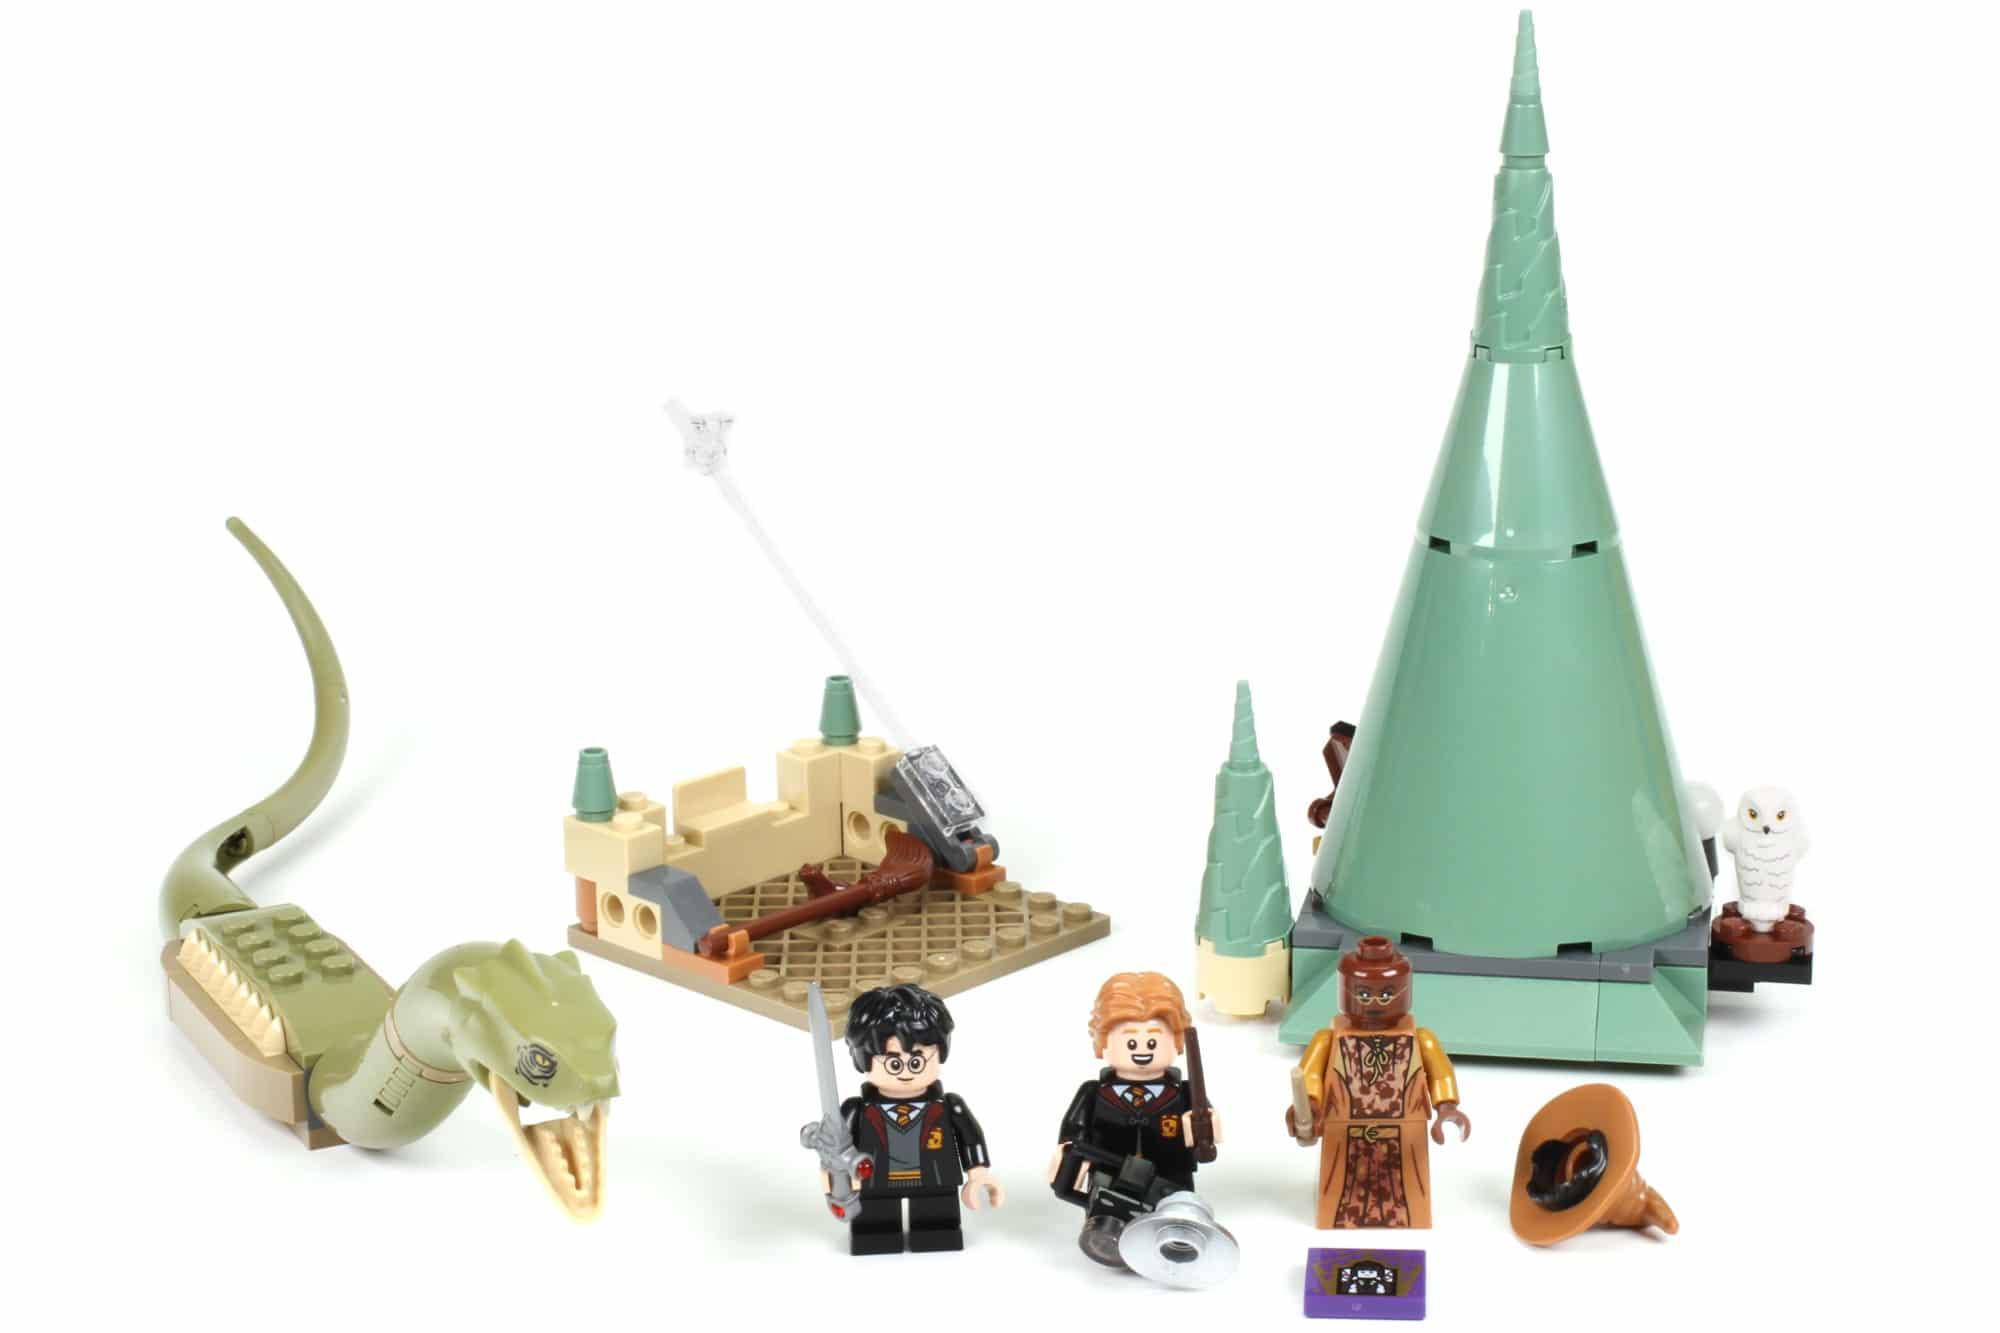 LEGO Harry Potter 76389 Hogwarts Kammer Des Schreckens Schritt 1 3